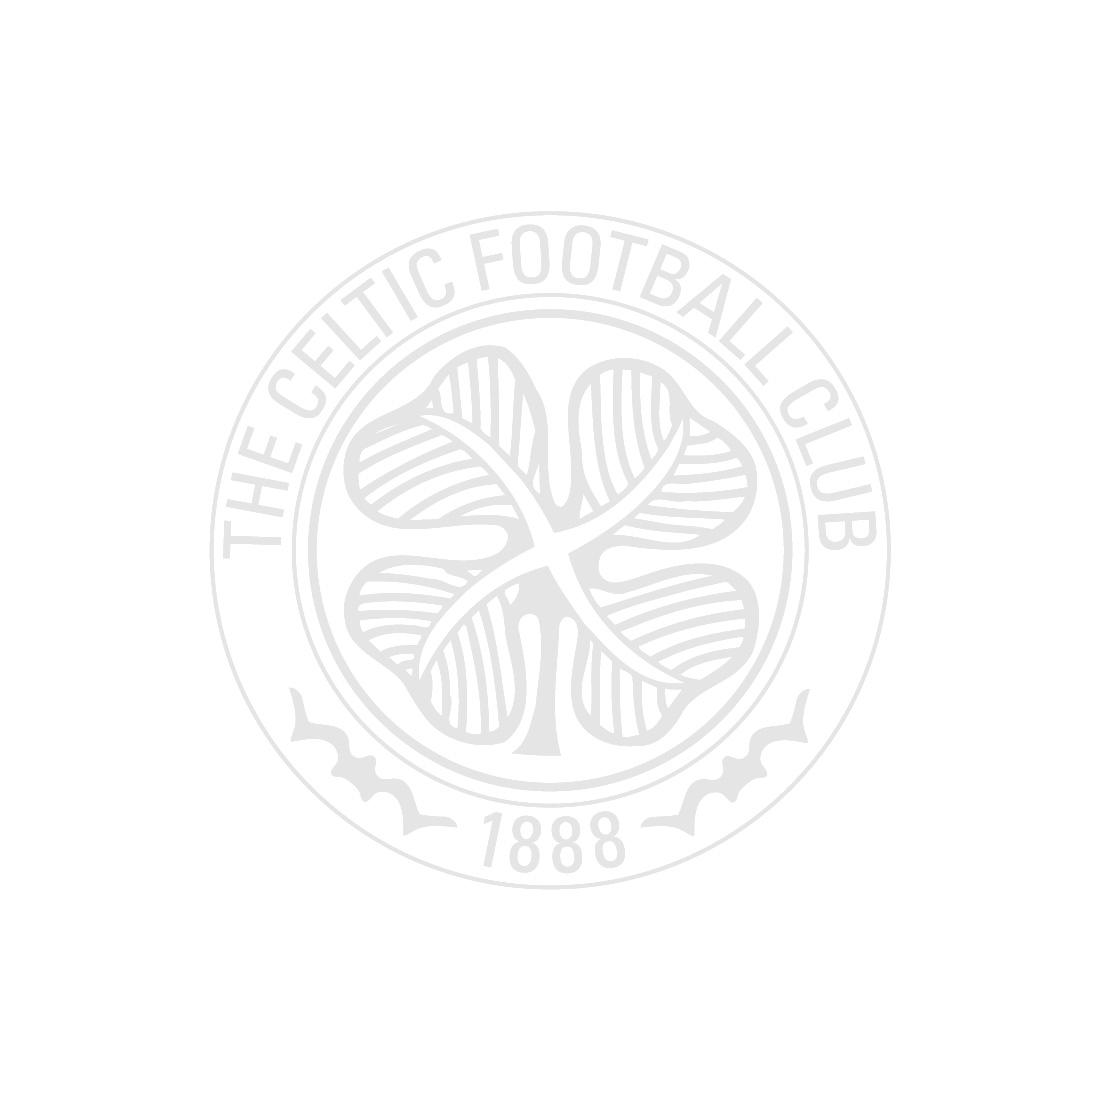 Celtic Hailey the Hound - Large